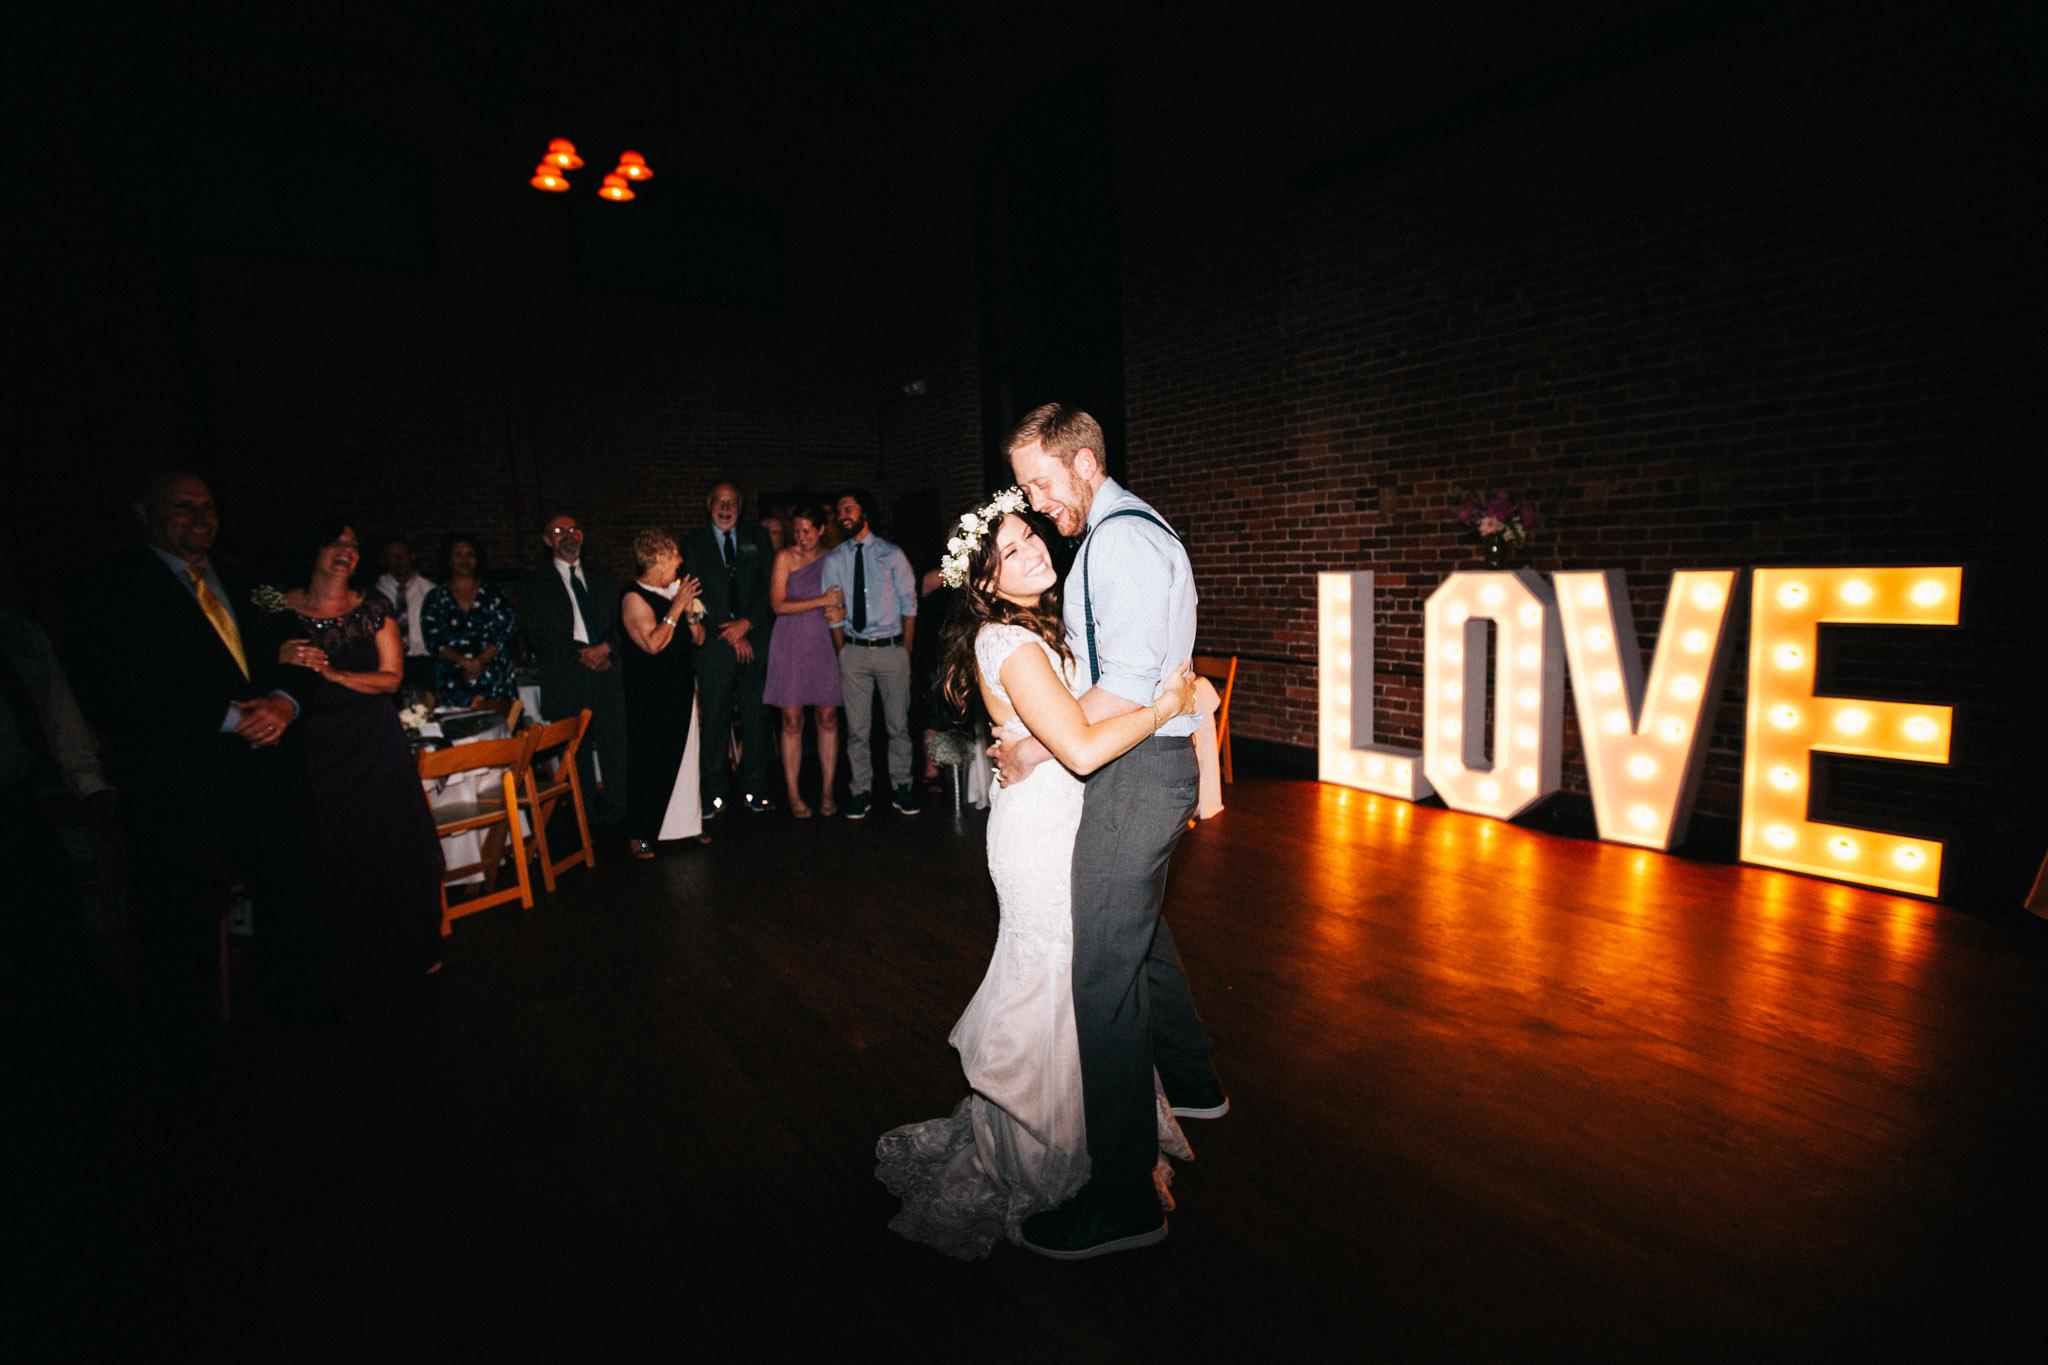 light up love wedding decoration